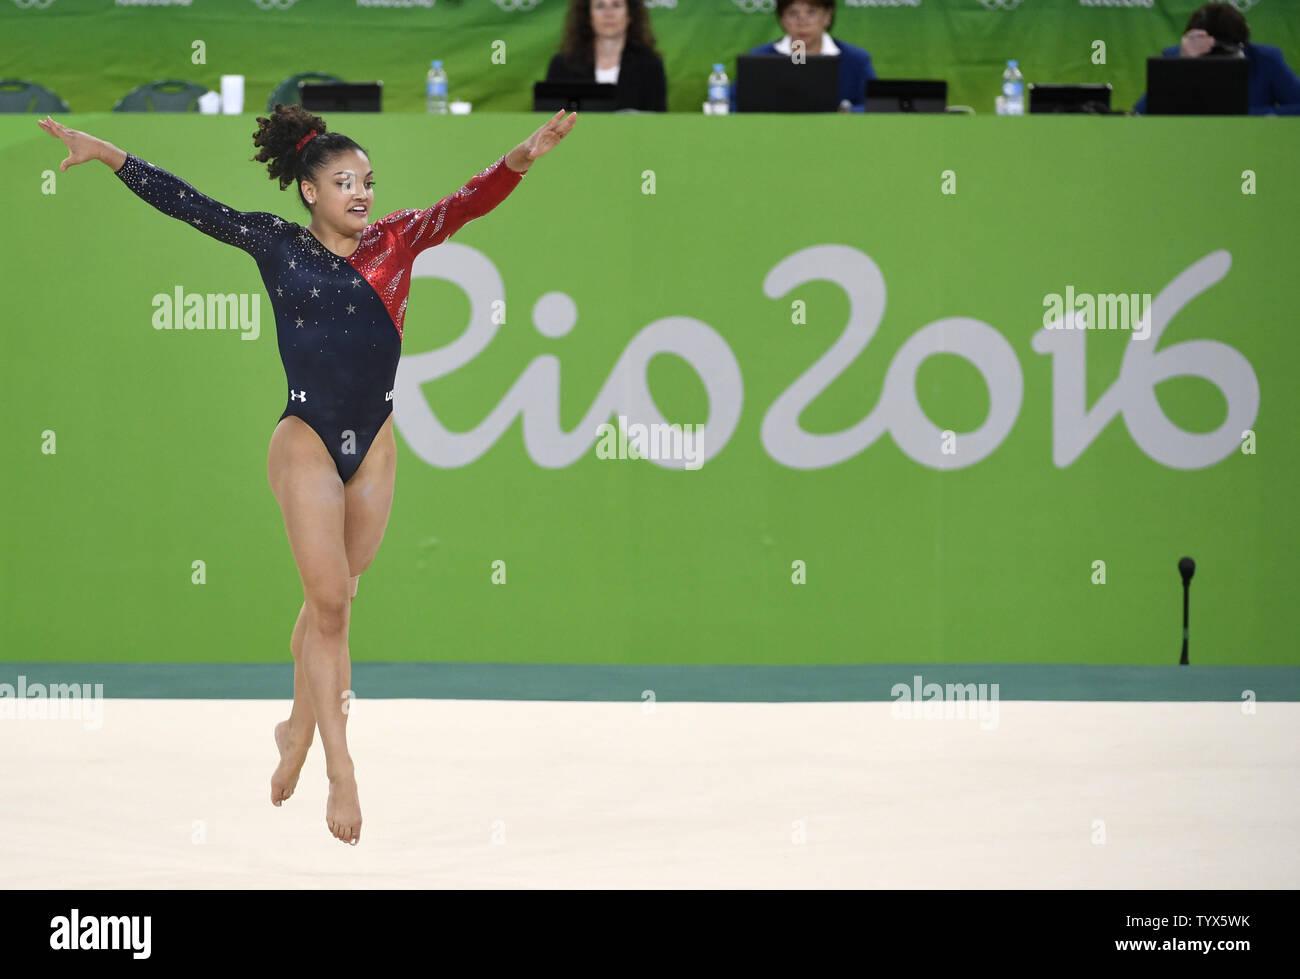 American Gymnast Lauren Hernandez Performs Her Routine In